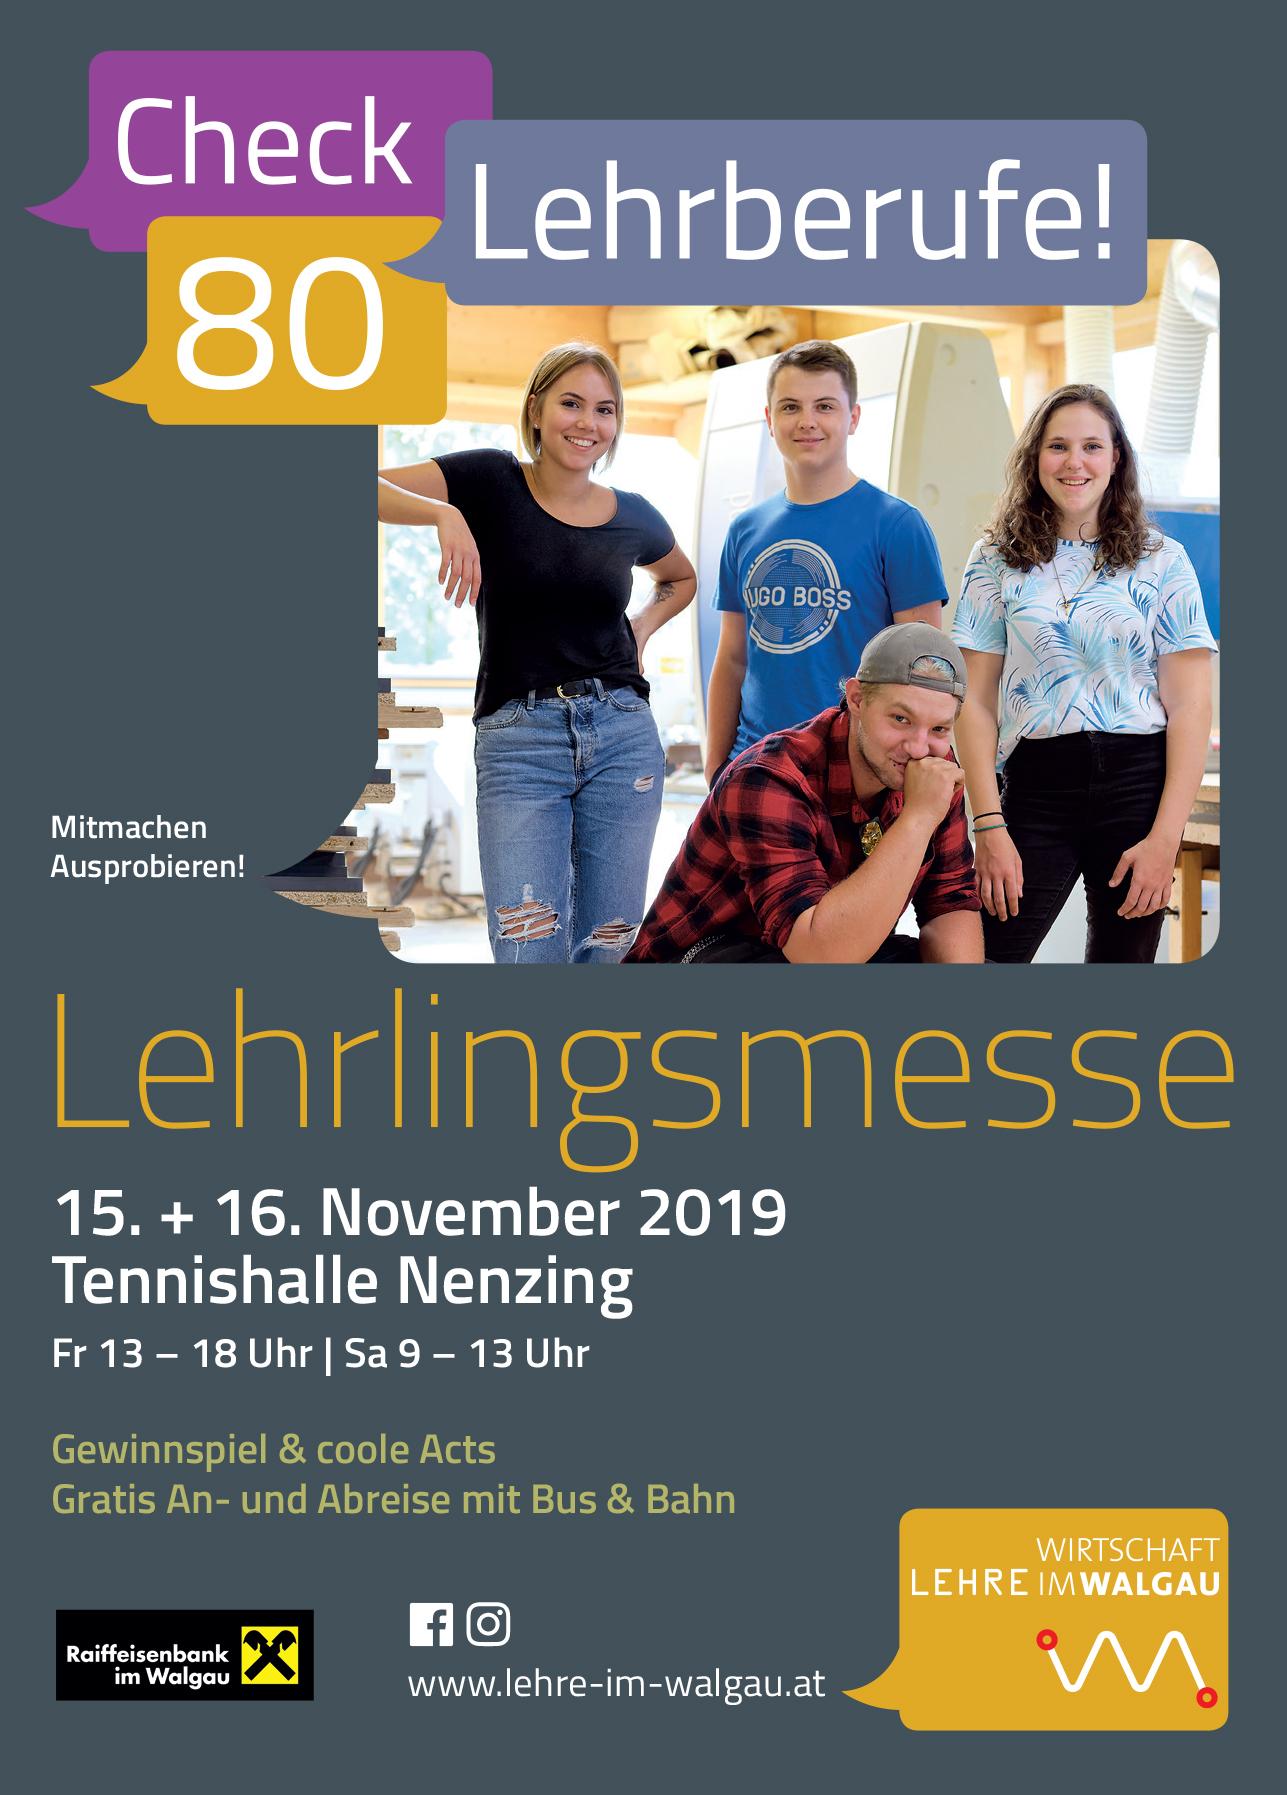 Lehrlingsmesse 2019 der Lehre im Walgau in Nenzing